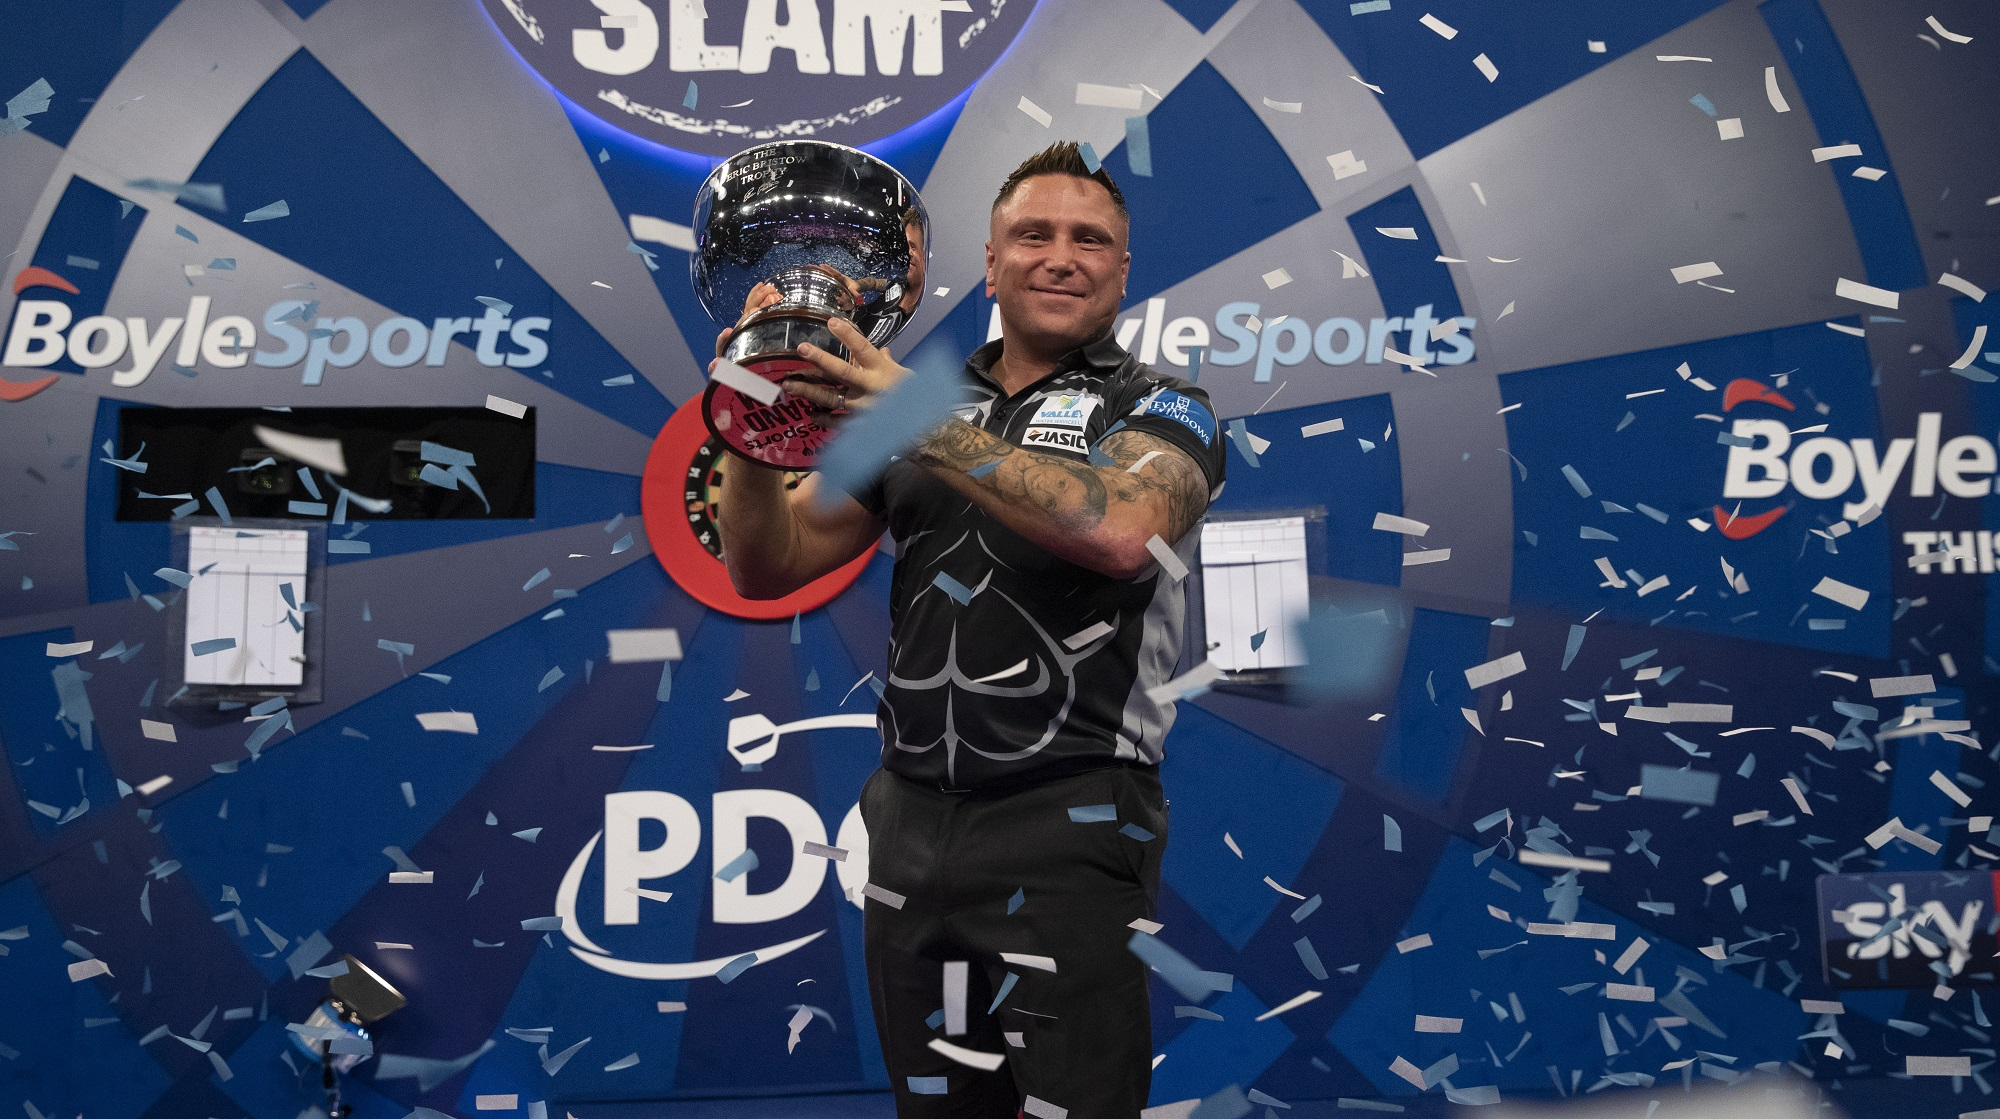 Pdc Grand Slam Of Darts 2020